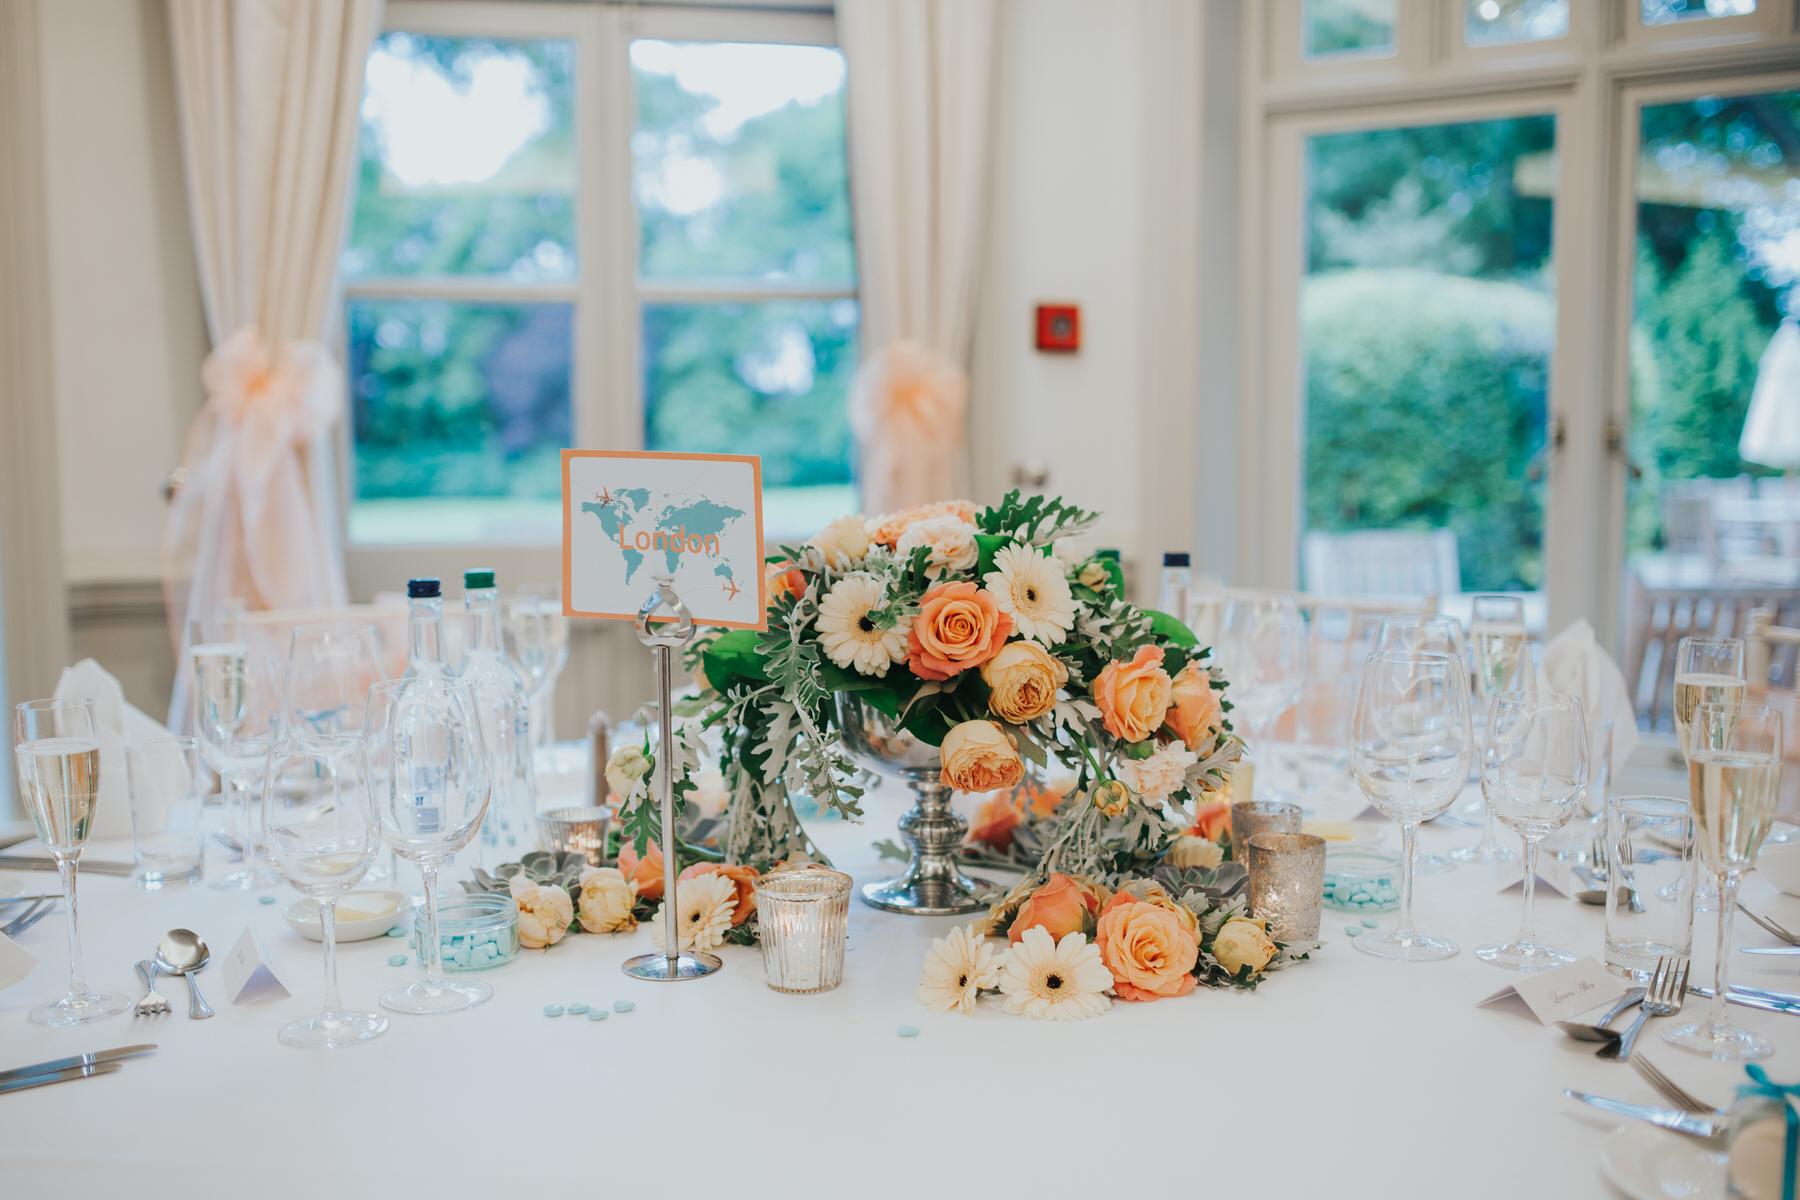 380 Woodlands Hotel wedding table setting.jpg